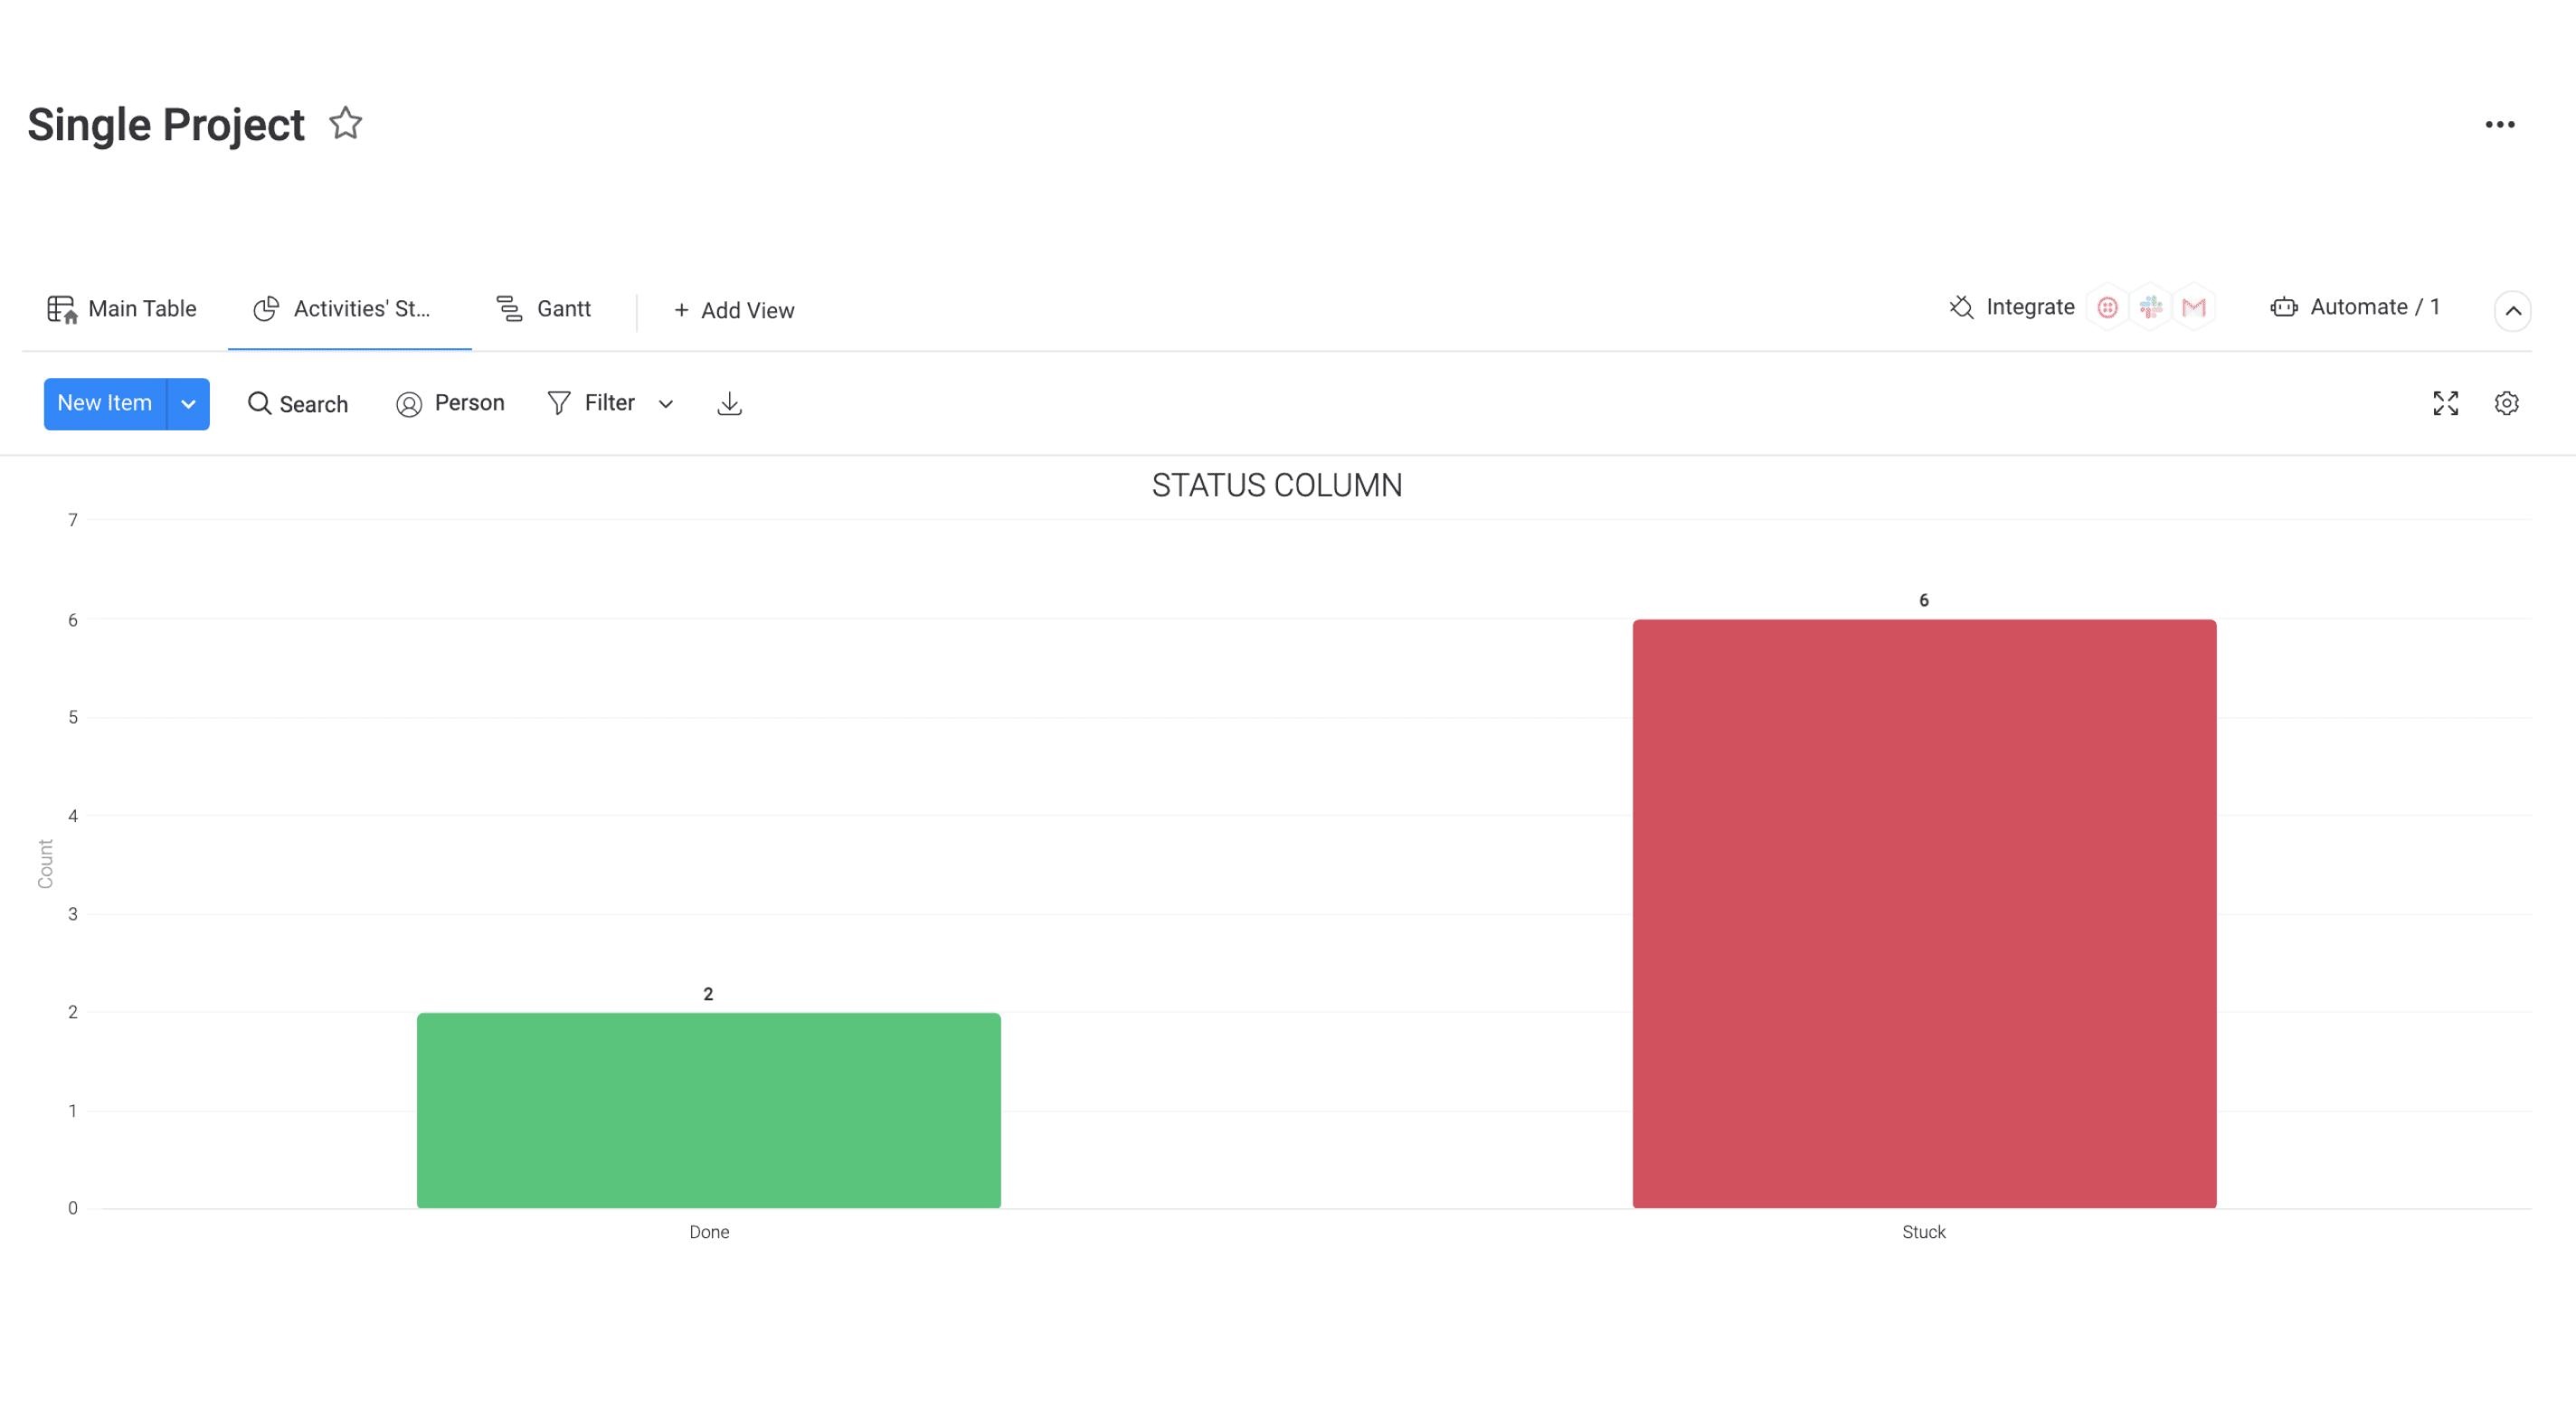 Single Project Bar Graph